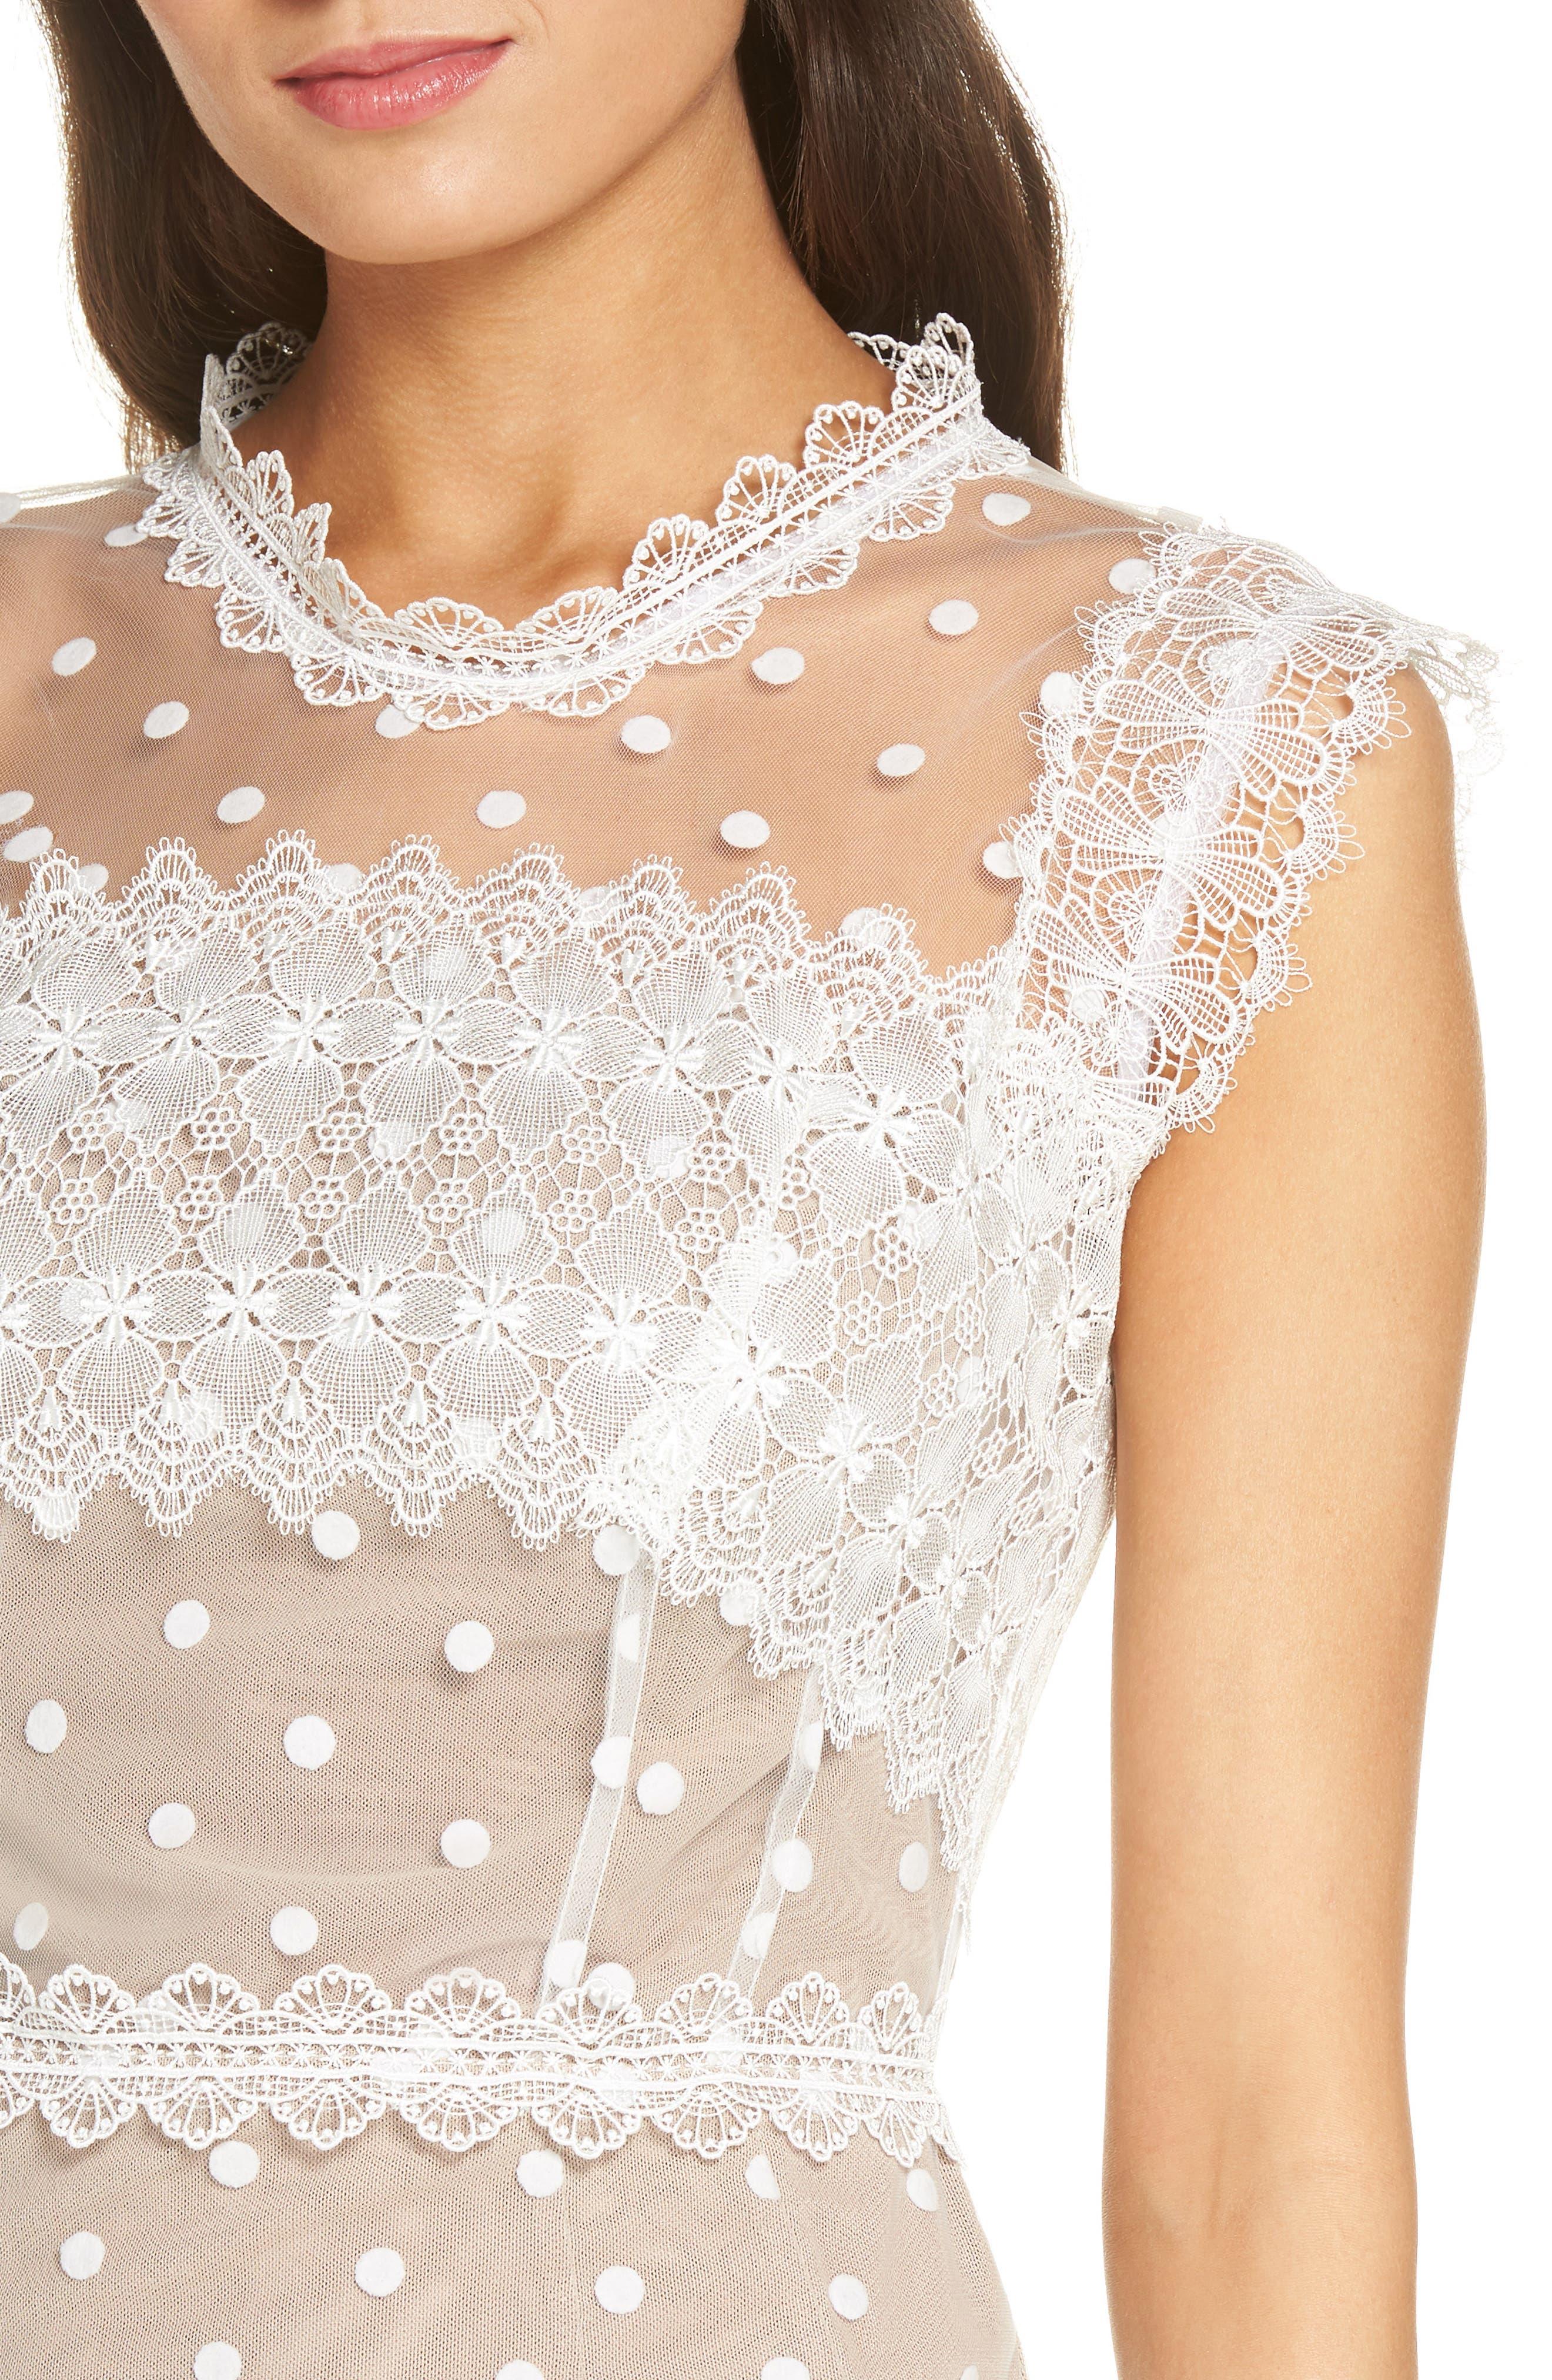 Majiorca Dot Lace Cocktail Dress,                             Alternate thumbnail 4, color,                             WHITE